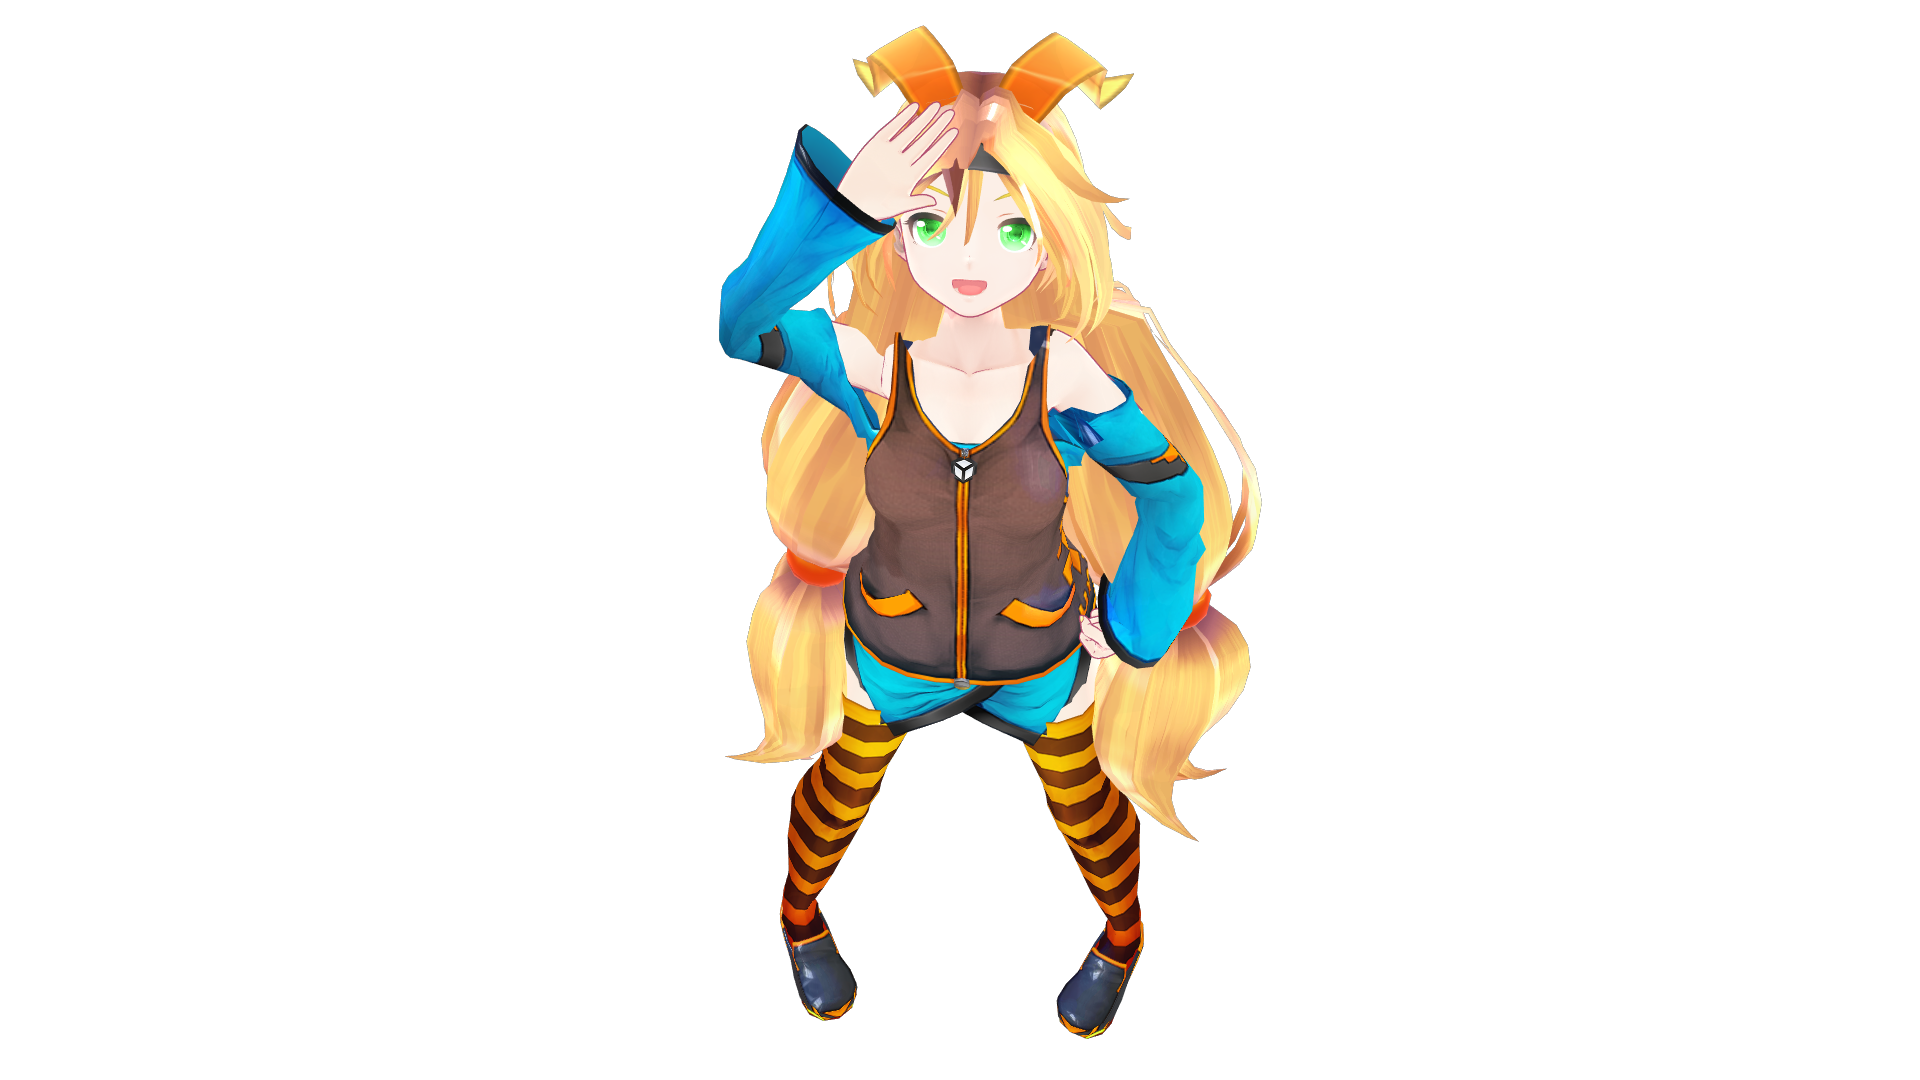 Unity Chan Chibi Model 3d: Cute Chibi Girl Anime 3d Model 3ds Max